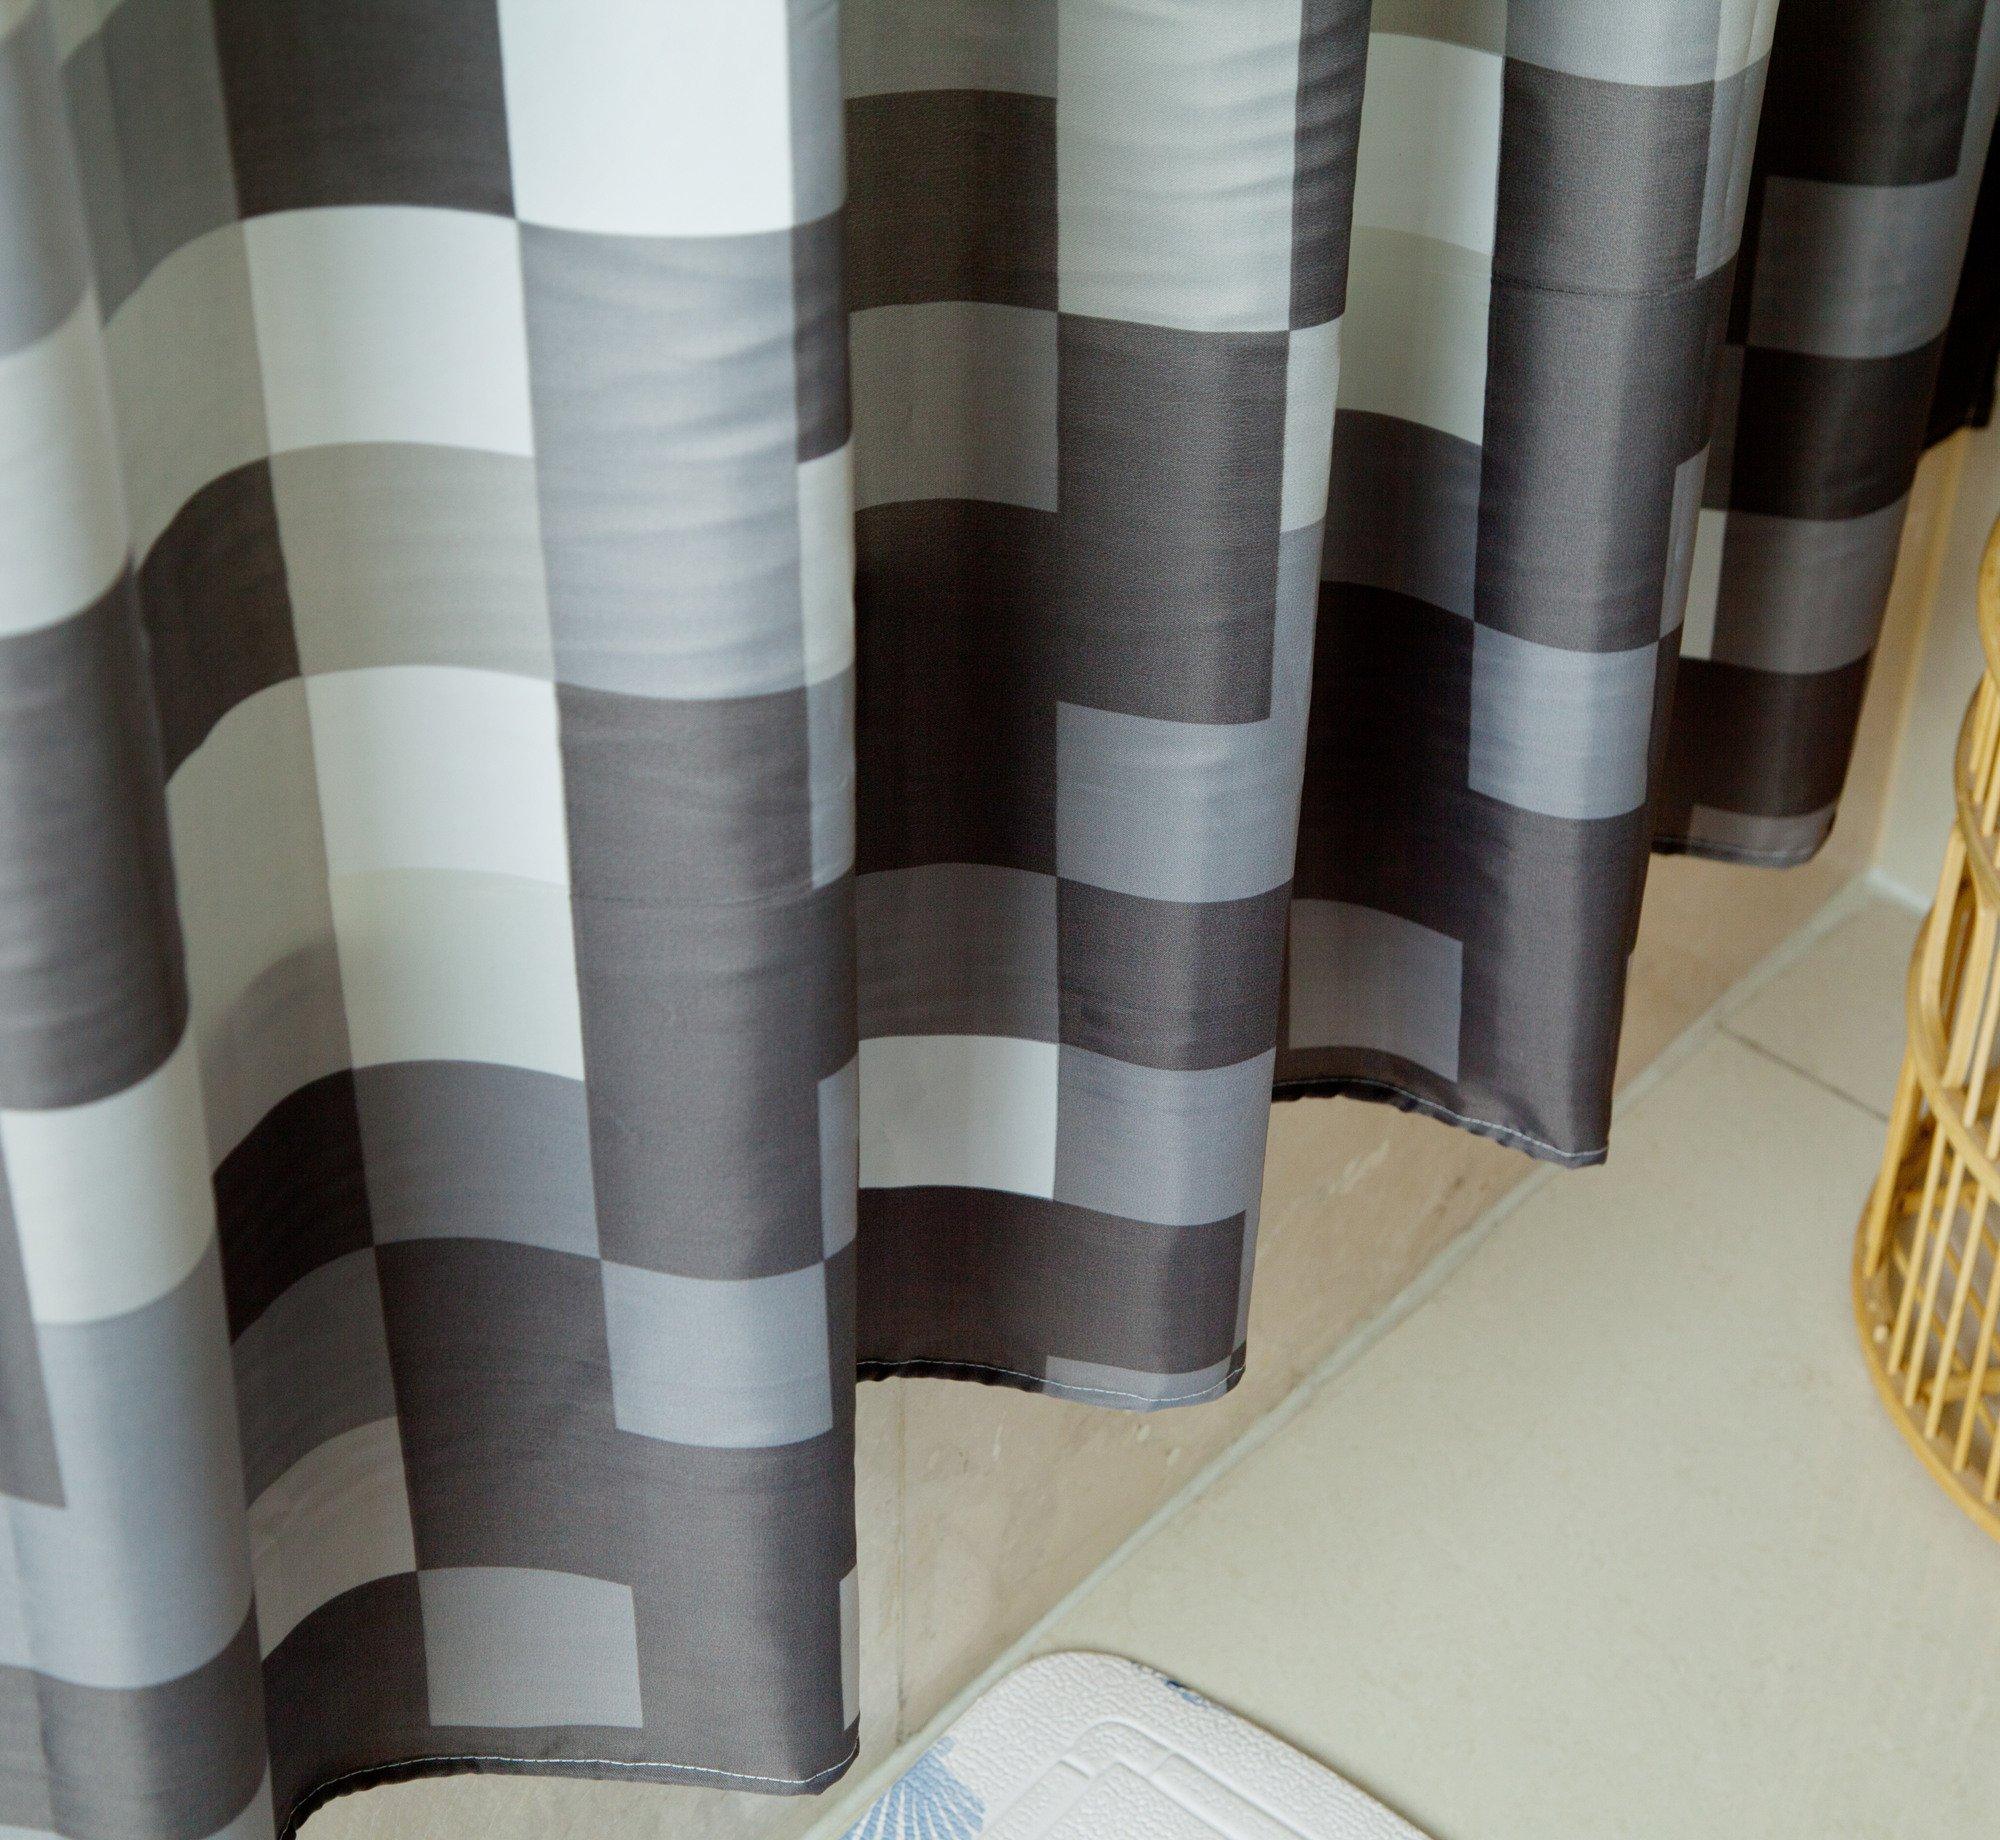 Sfoothome Polyester Fabric Shower Curtain Waterproof Bathroom Shower Curtains - 100% Polyester 100% durable polyester shower curtain has weights at the bottom of it - shower-curtains, bathroom-linens, bathroom - 91av32vi0WL -